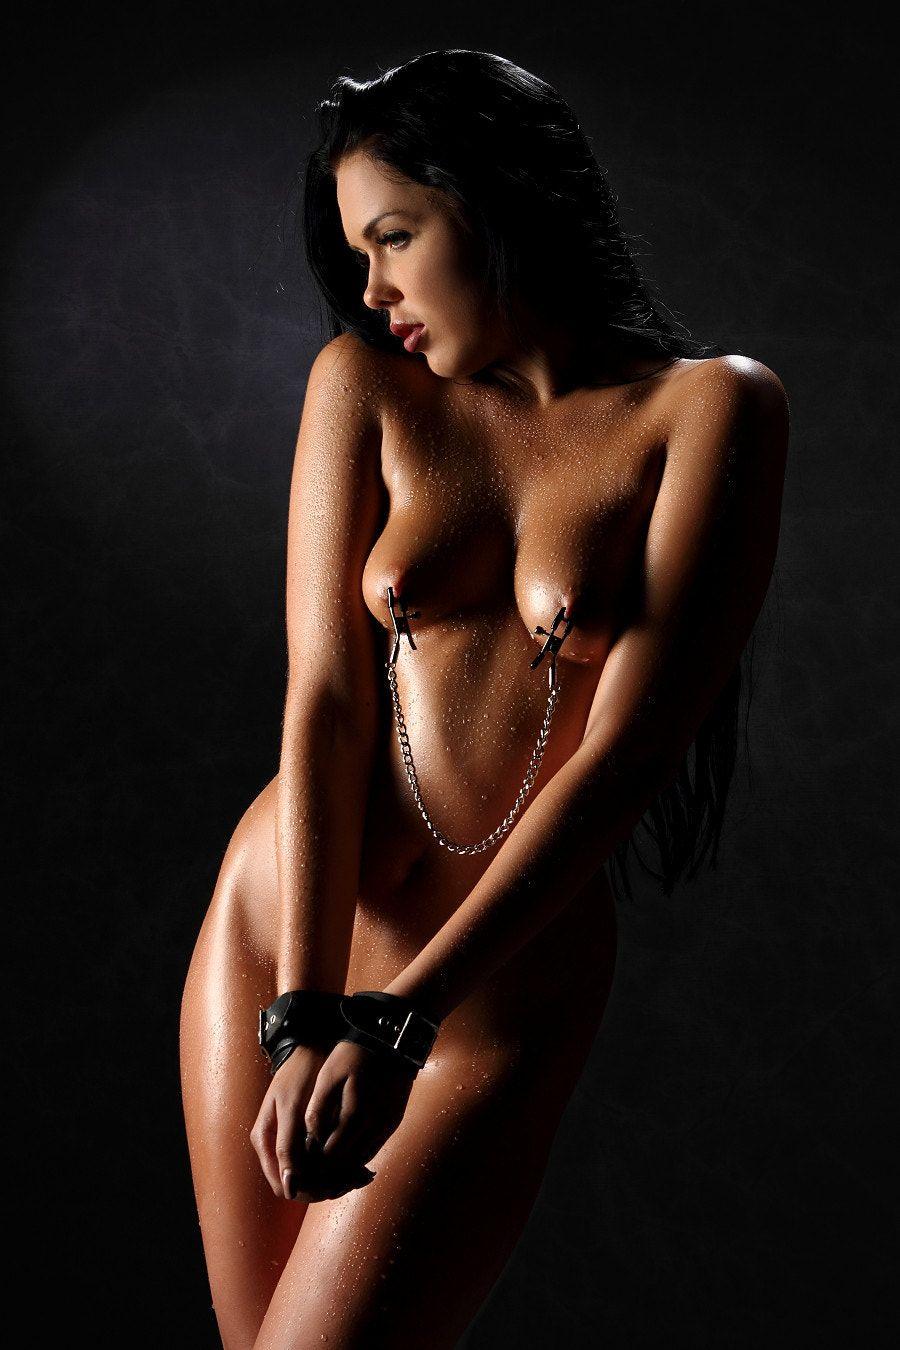 Nude art on nippal with